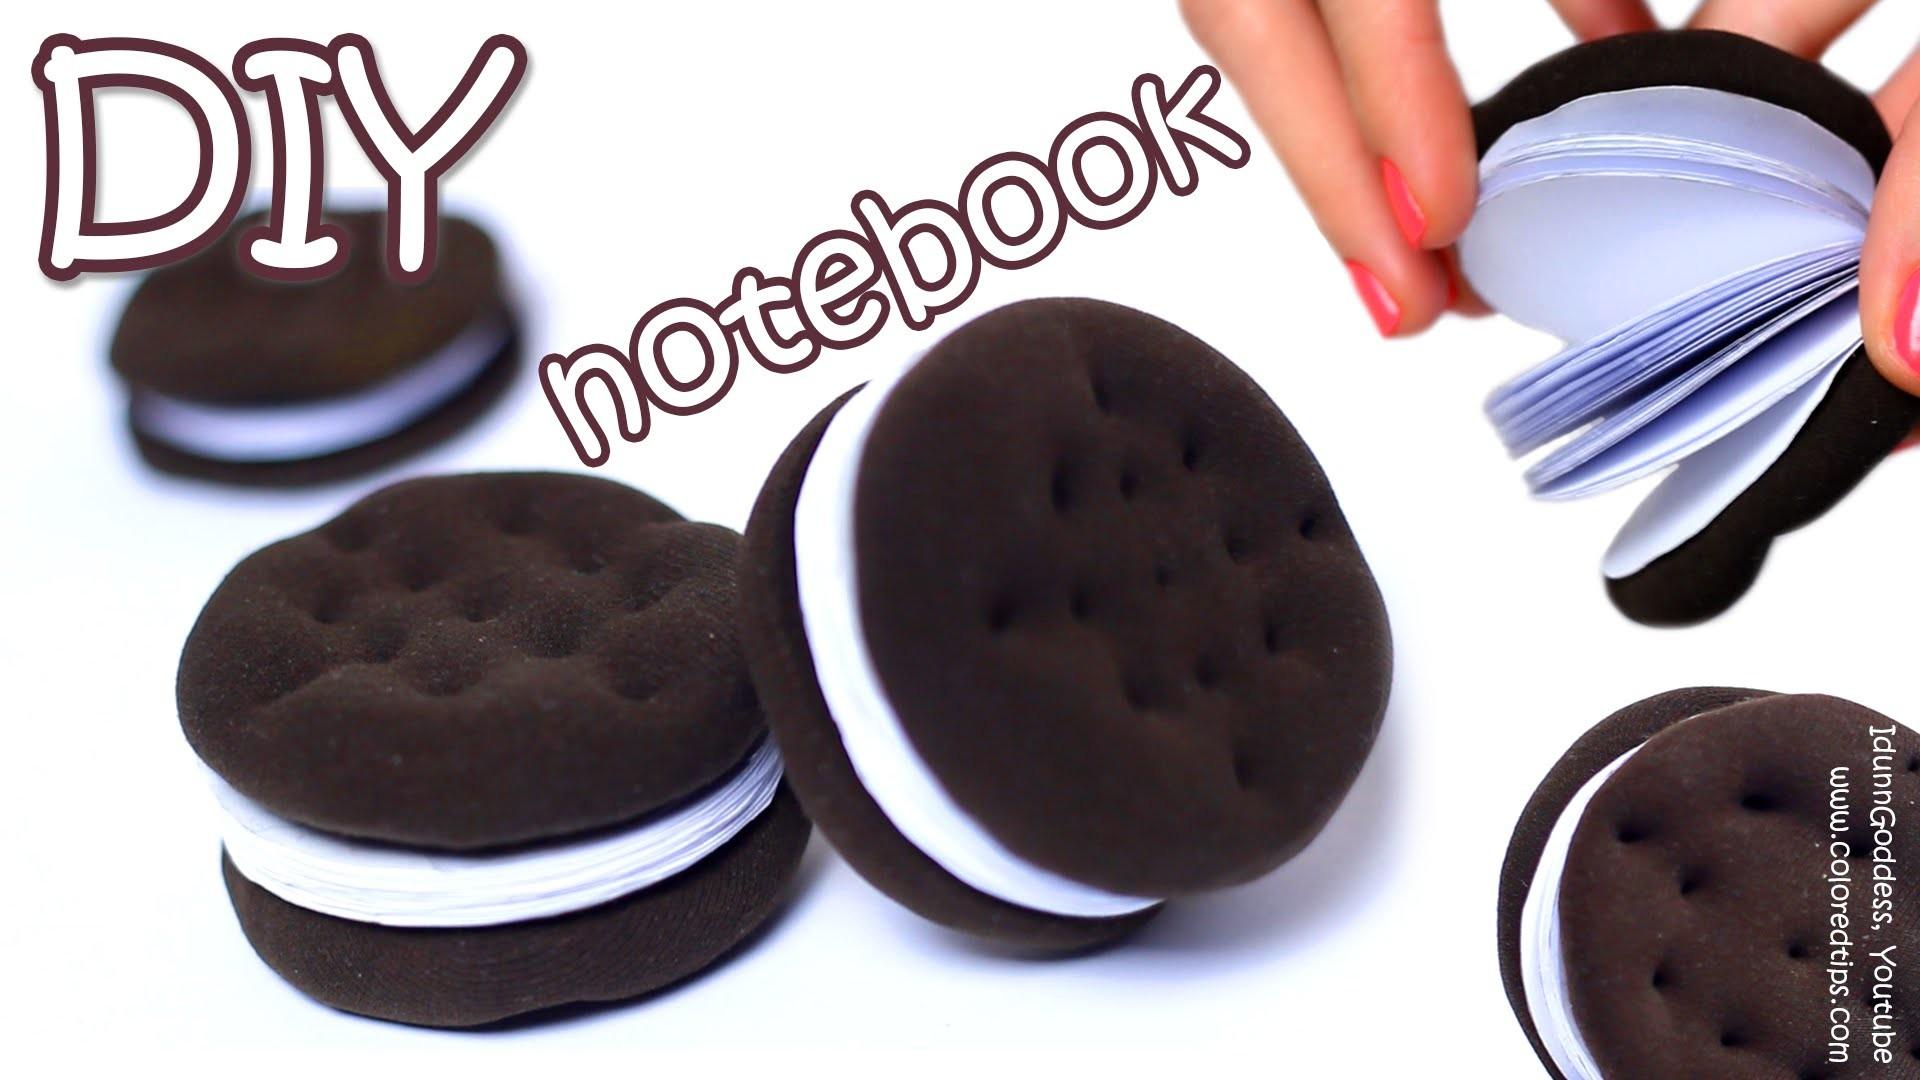 How To Make Oreo Notebook - DIY Chocolate Sandwich Cookies Notebook Tutorial